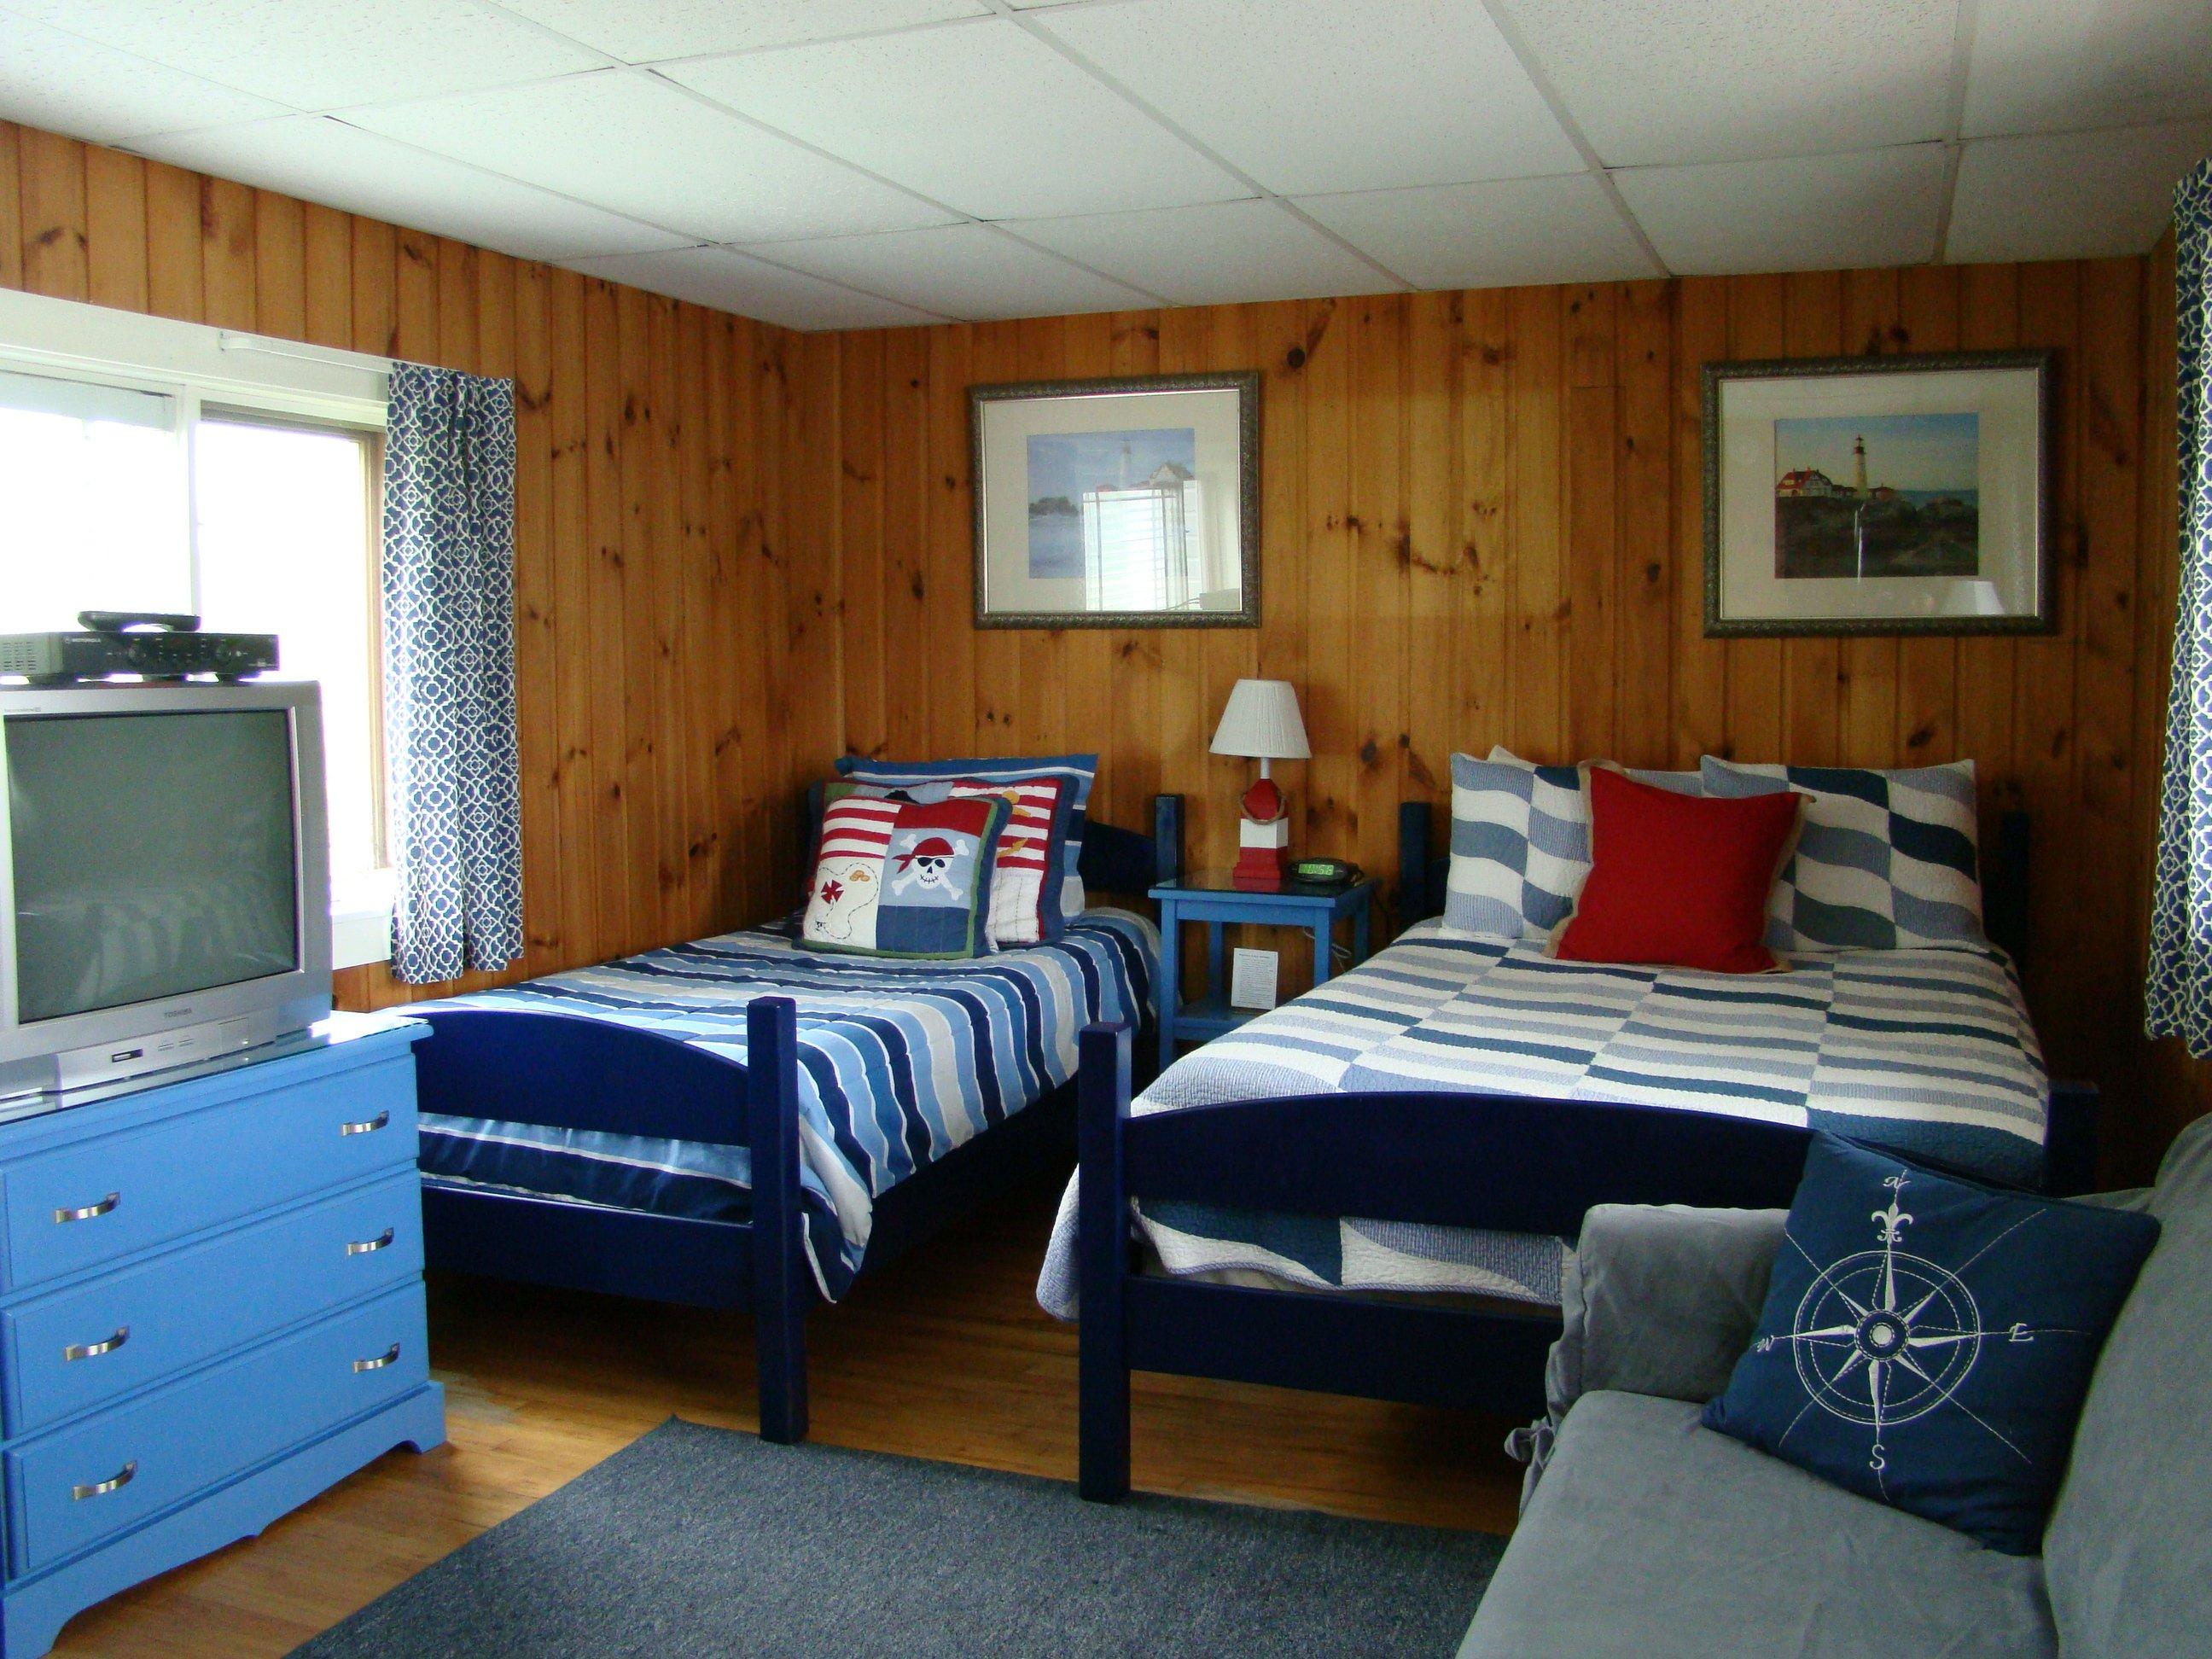 Motel room #16 - full bed, twin bed, full sleeper sofa, TV, refrigerator, microwave, coffeemaker